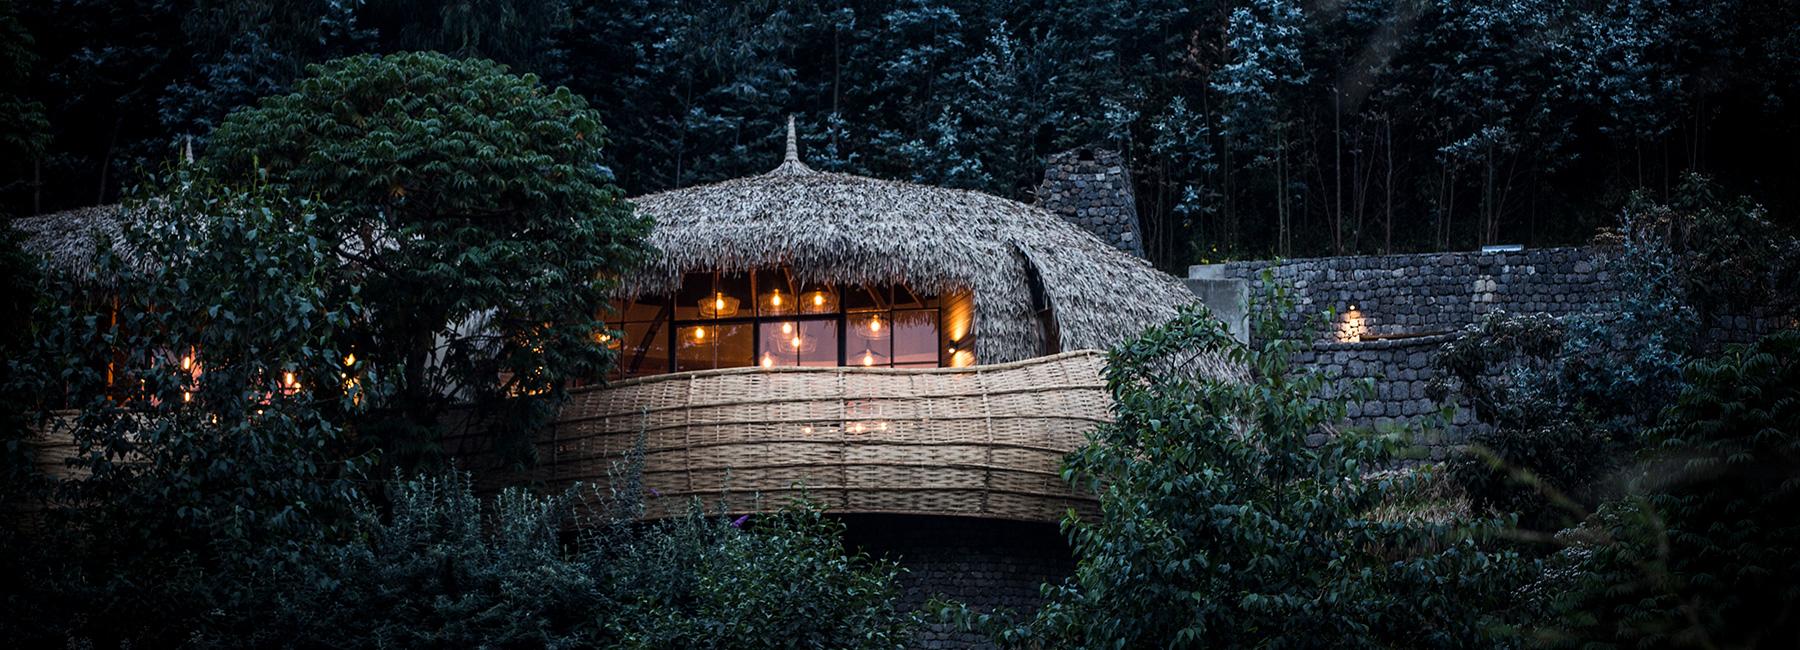 wilderness-safaris-bisate-lodge-volcanoes-national-park-rwanda-designboom-1800.jpg